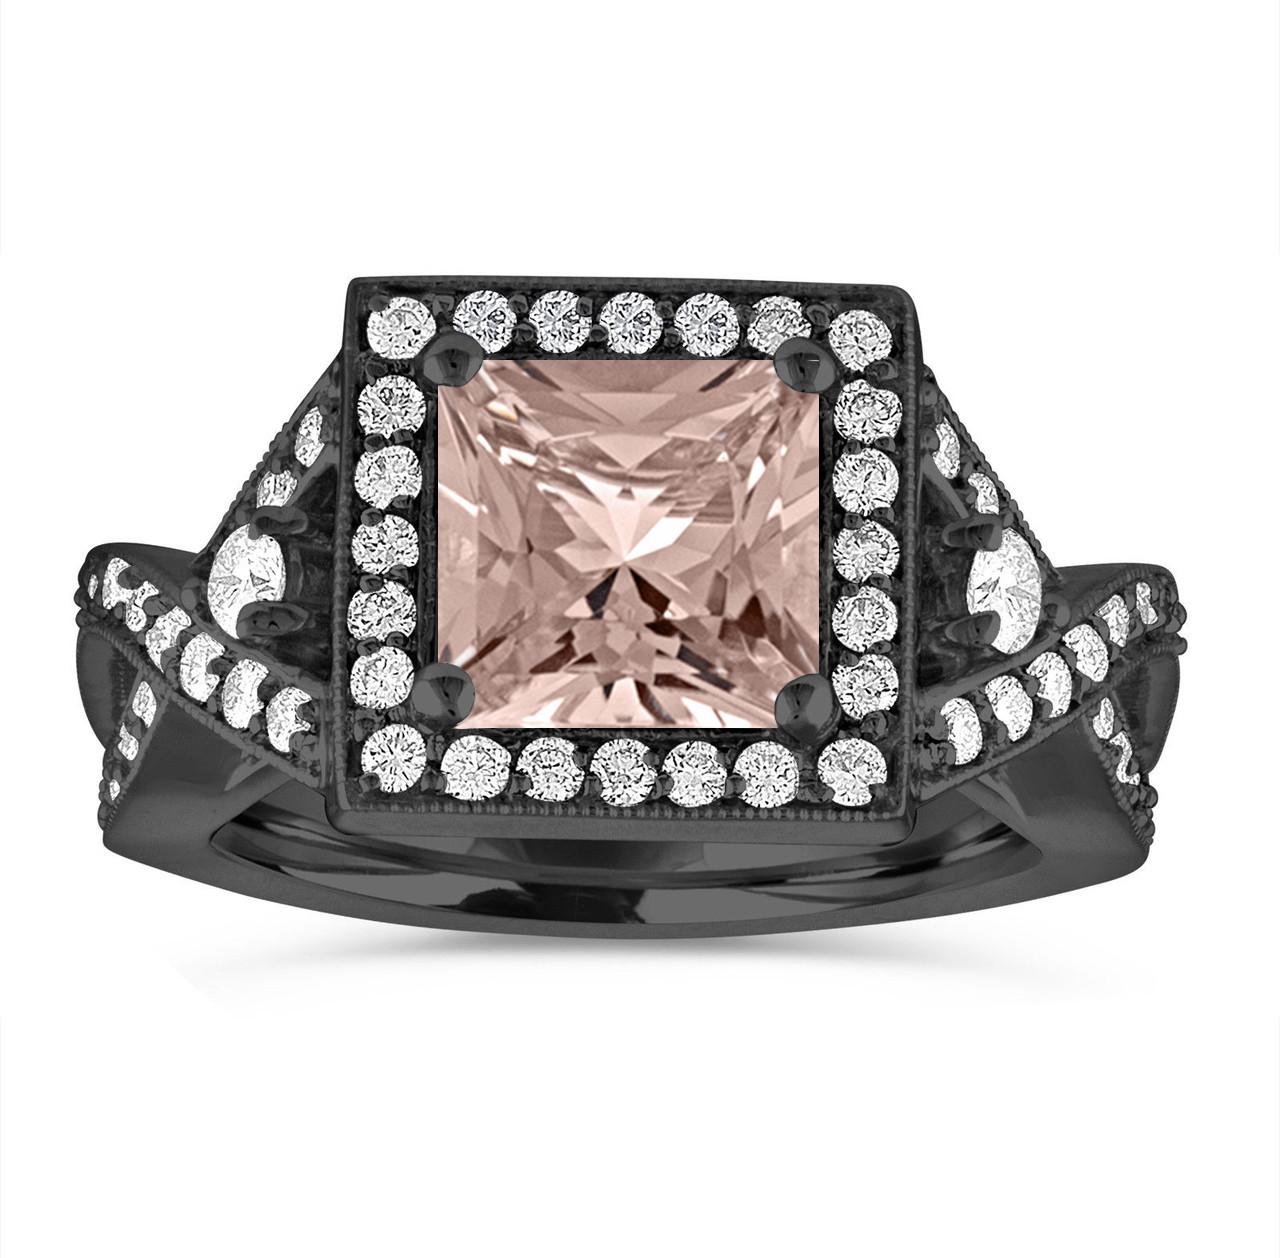 0b42f436084a8 Princess Cut Morganite Engagement Ring, Vintage Wedding Ring, Bridal  Diamond Ring, 14K Black Gold Unique Halo 2.30 Carat Certified Handmade